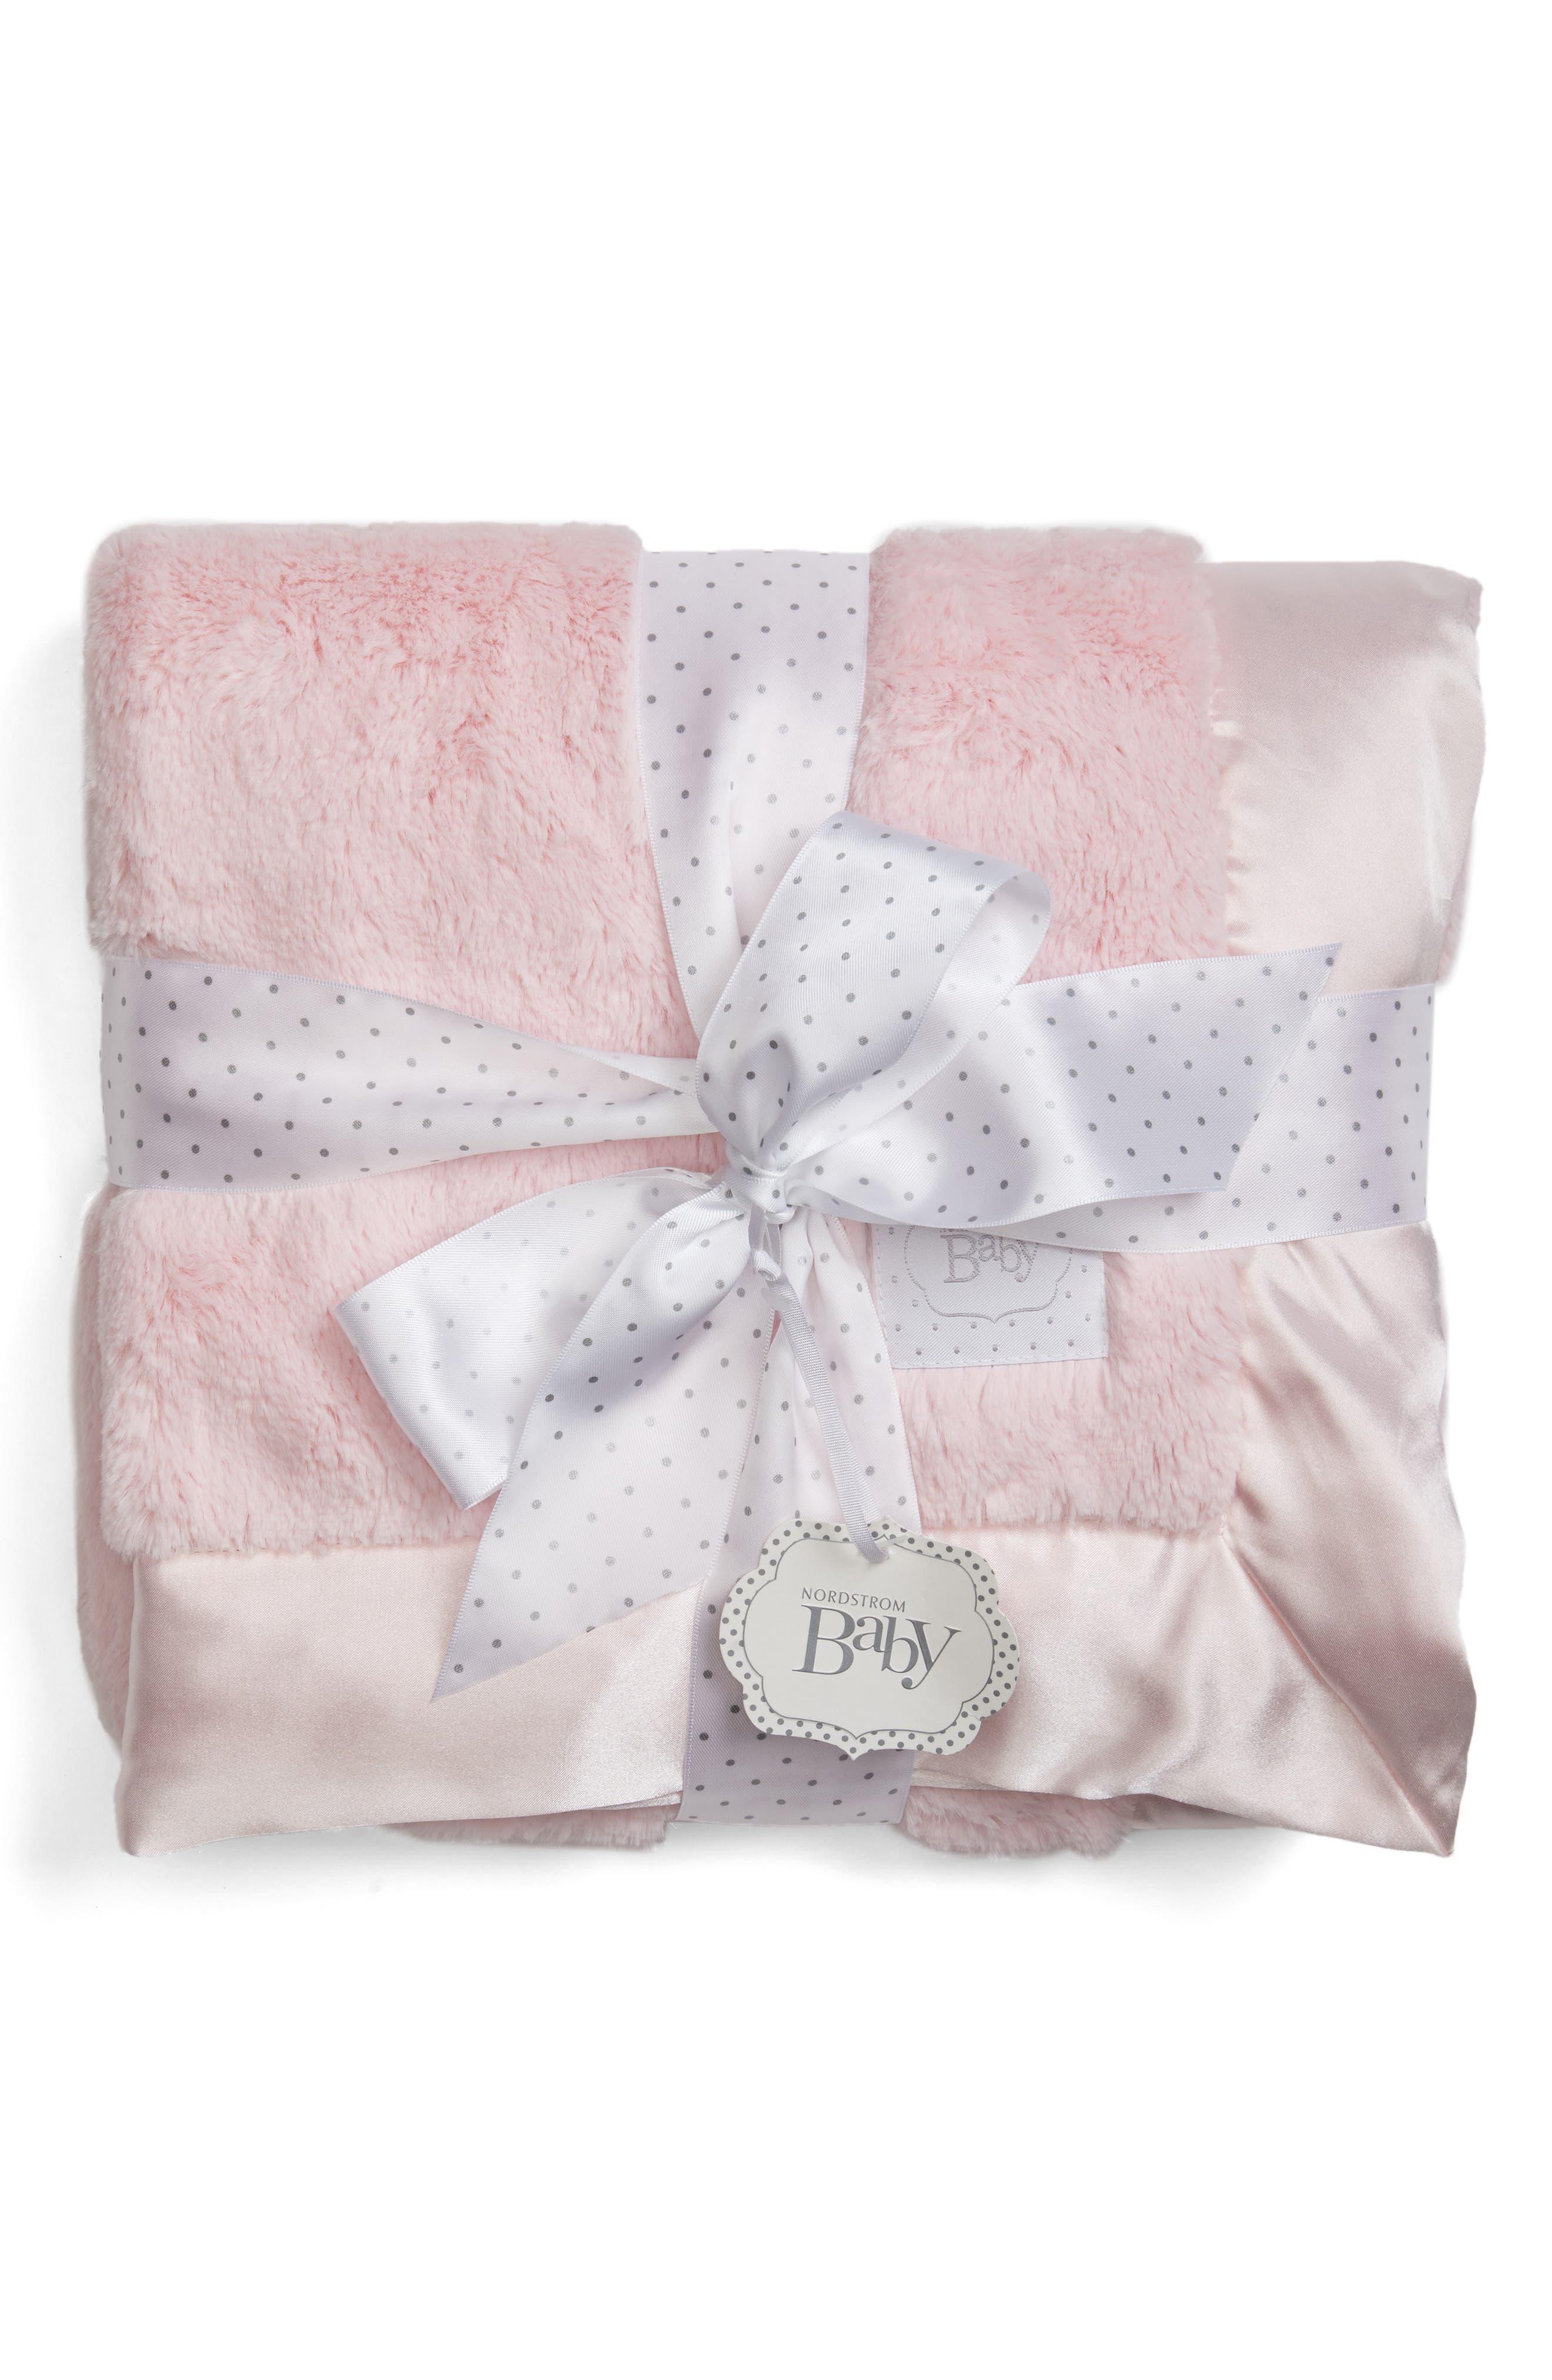 Nordstrom Baby Luxe Plush Blanket